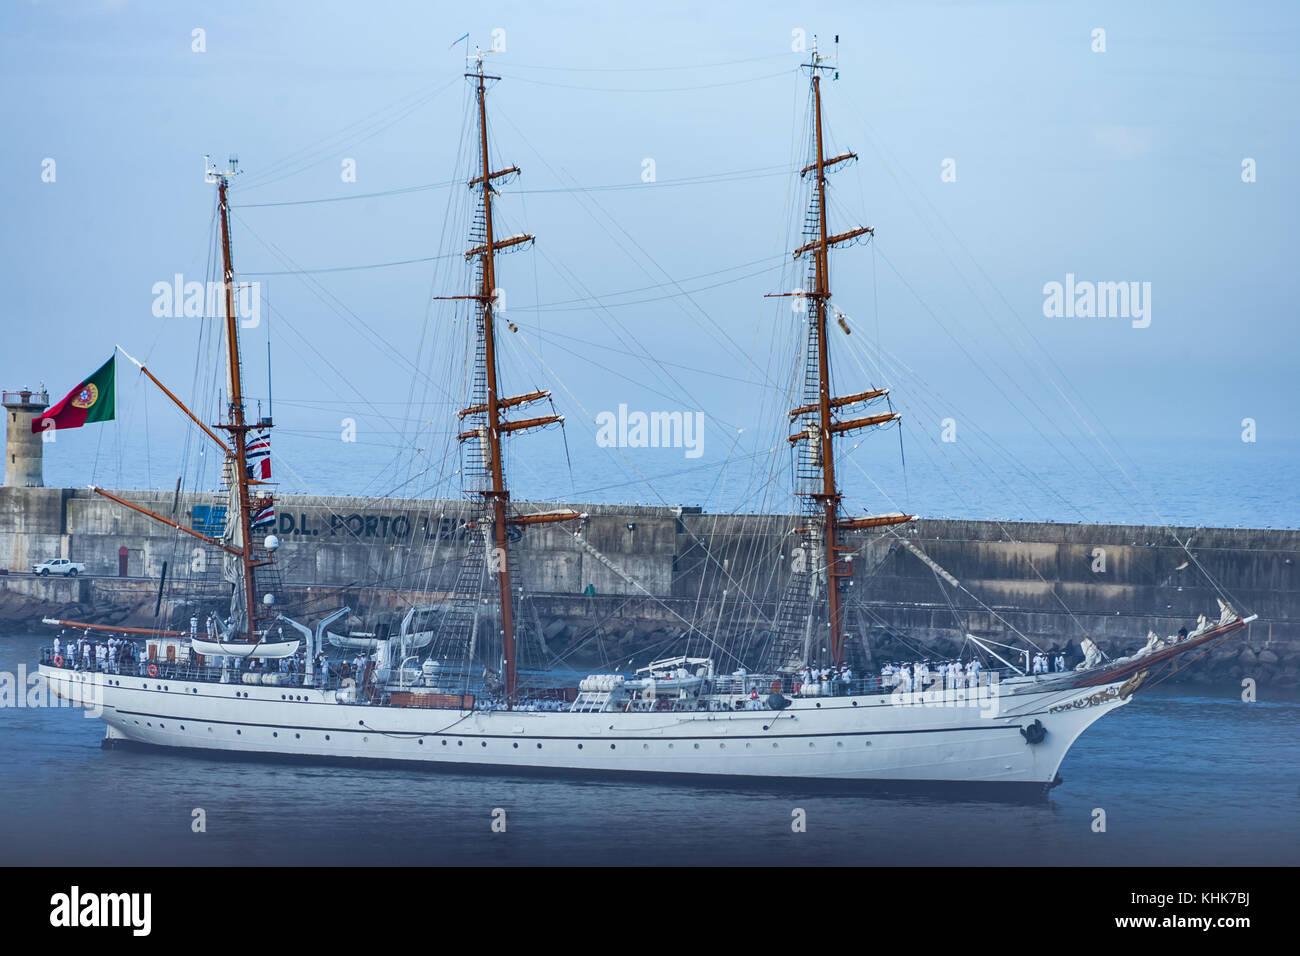 Sailing Boat enters Porto harbour - Stock Image